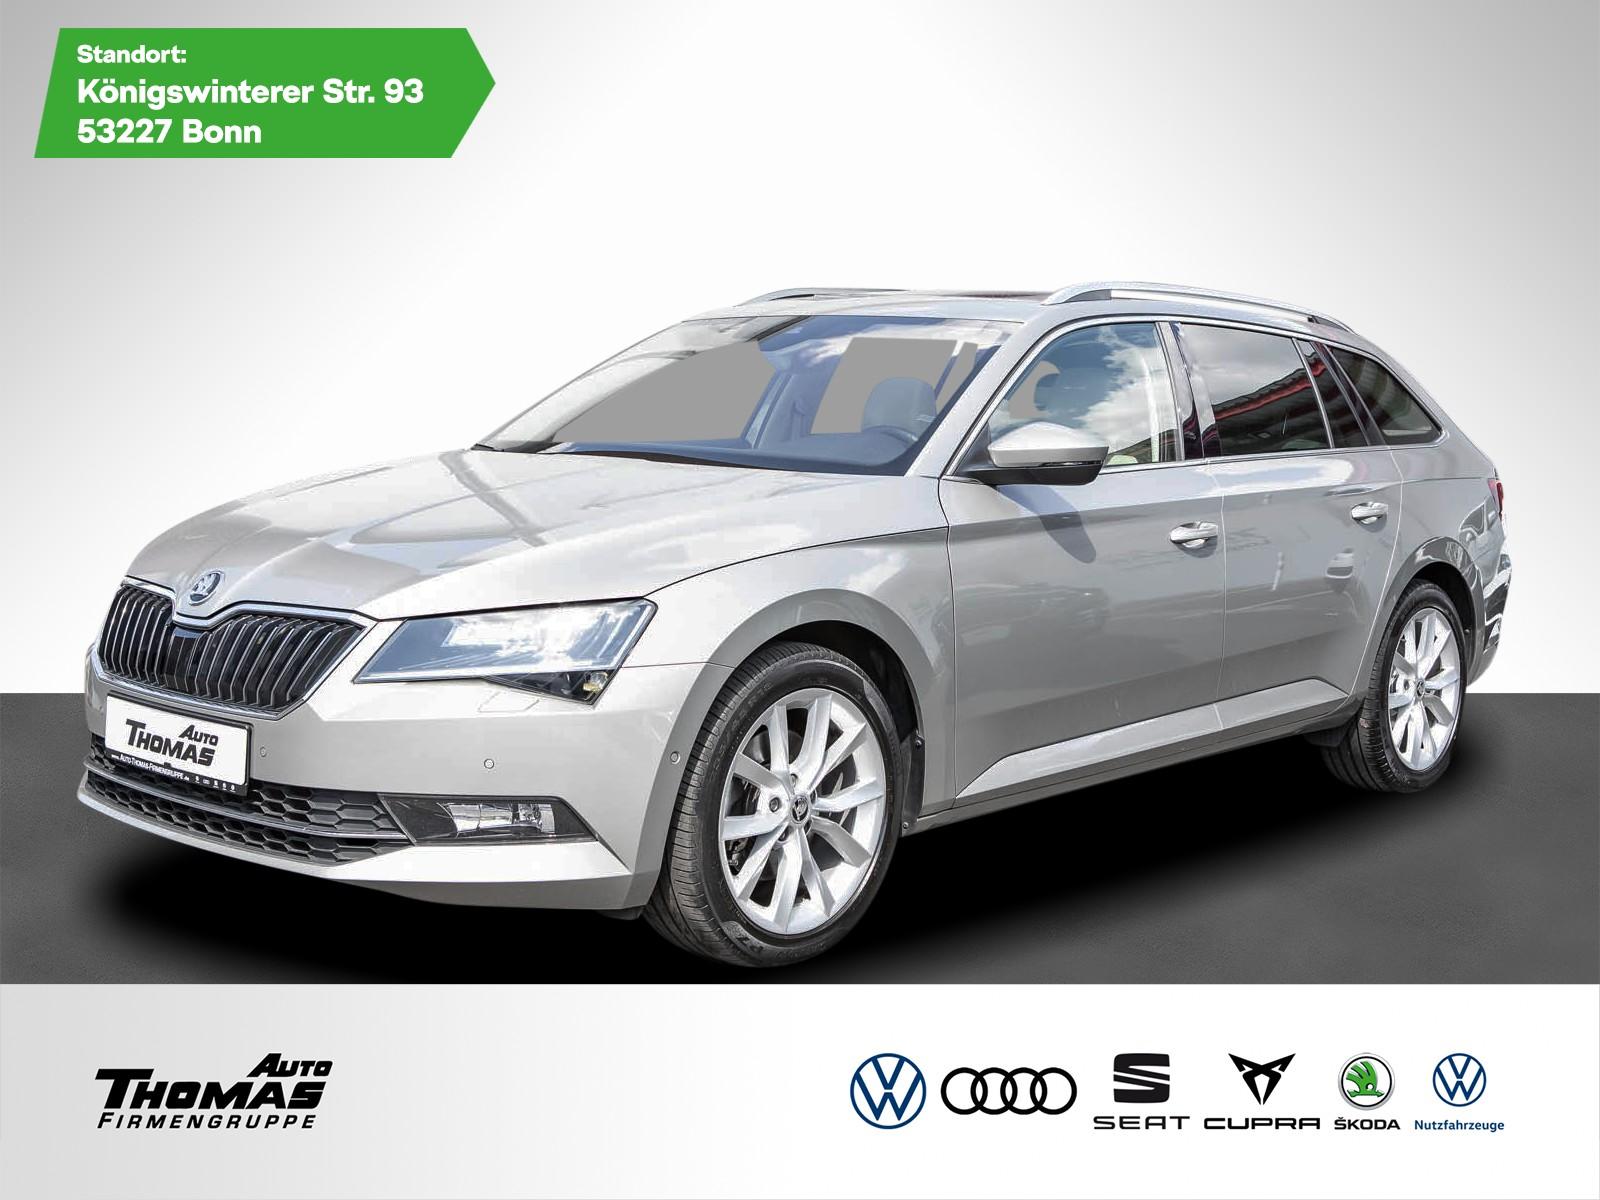 Skoda Superb III Combi Style 2.0 TSI DSG*PANO*AHK*NAVI, Jahr 2017, Benzin